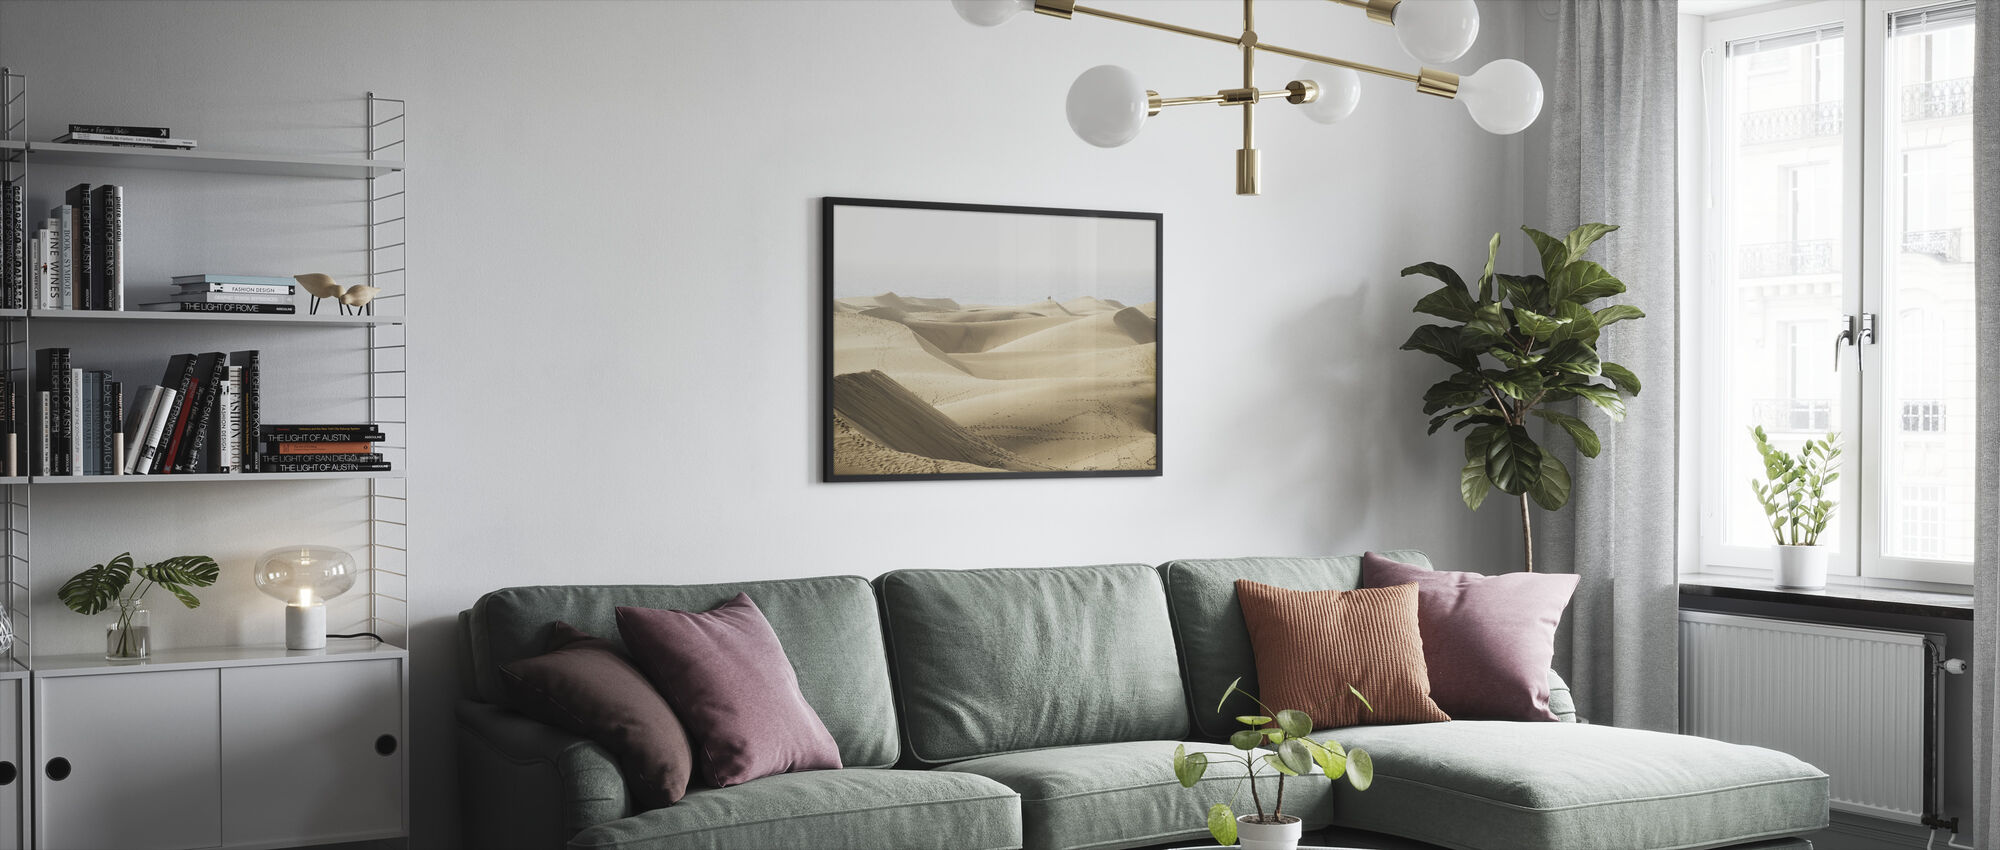 Maspolomas sanddyner - Inramad tavla - Vardagsrum